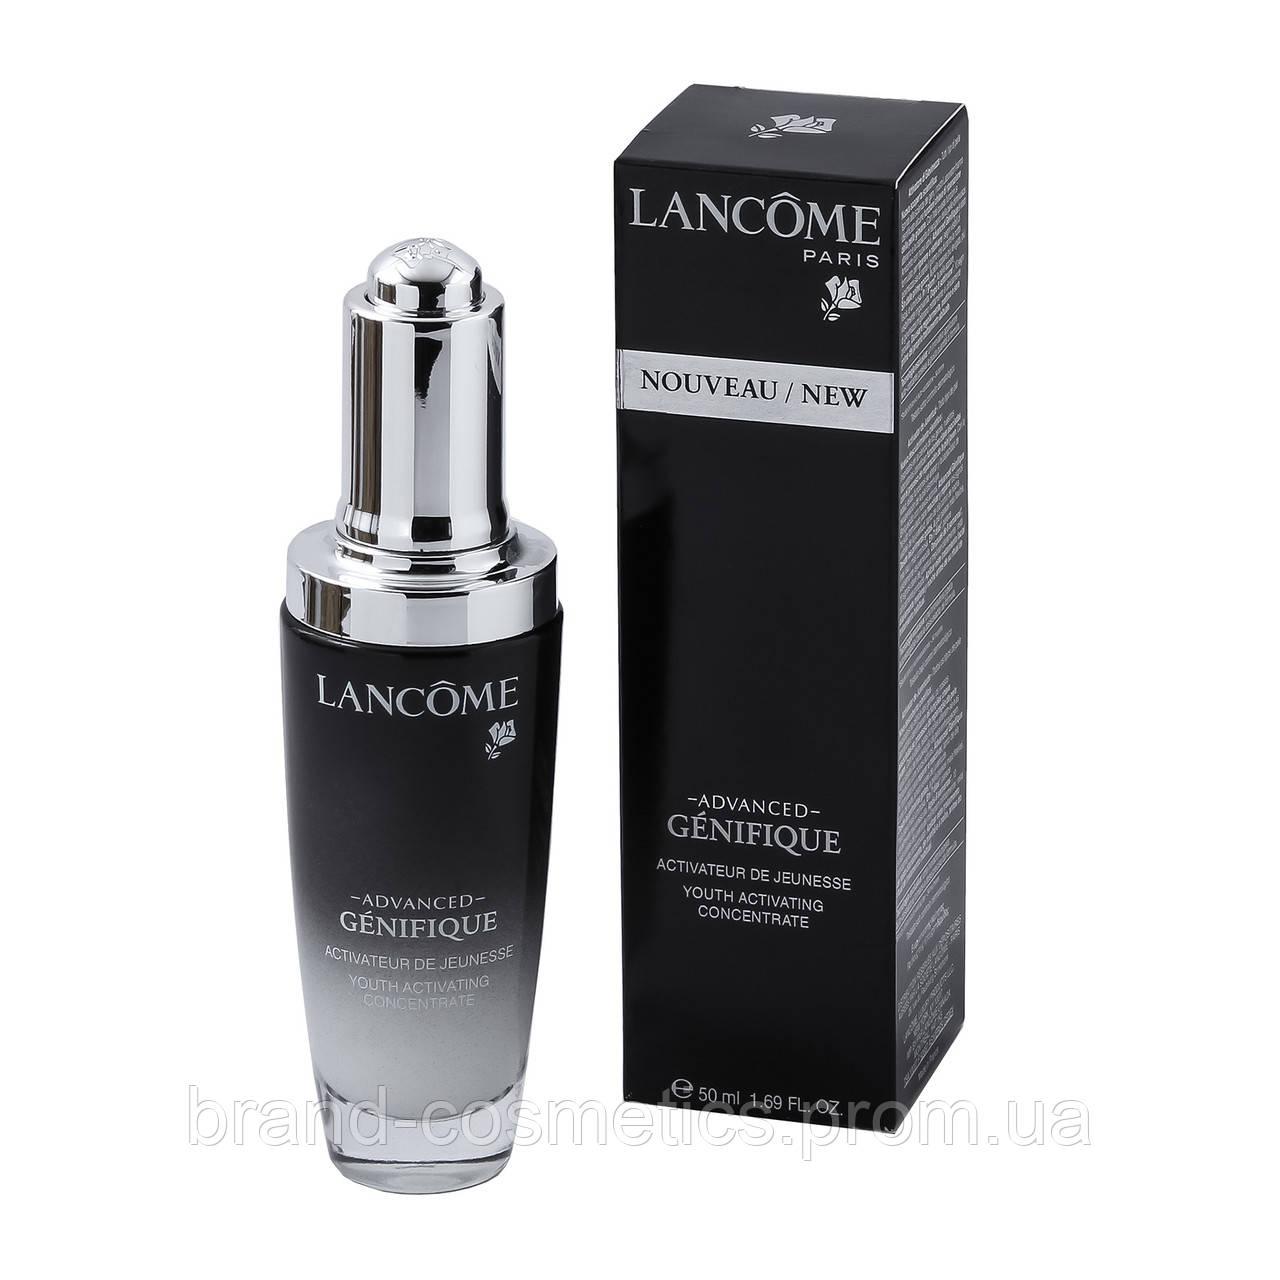 Сыворотка для лица Lancome Genifique Advanced 50 мл